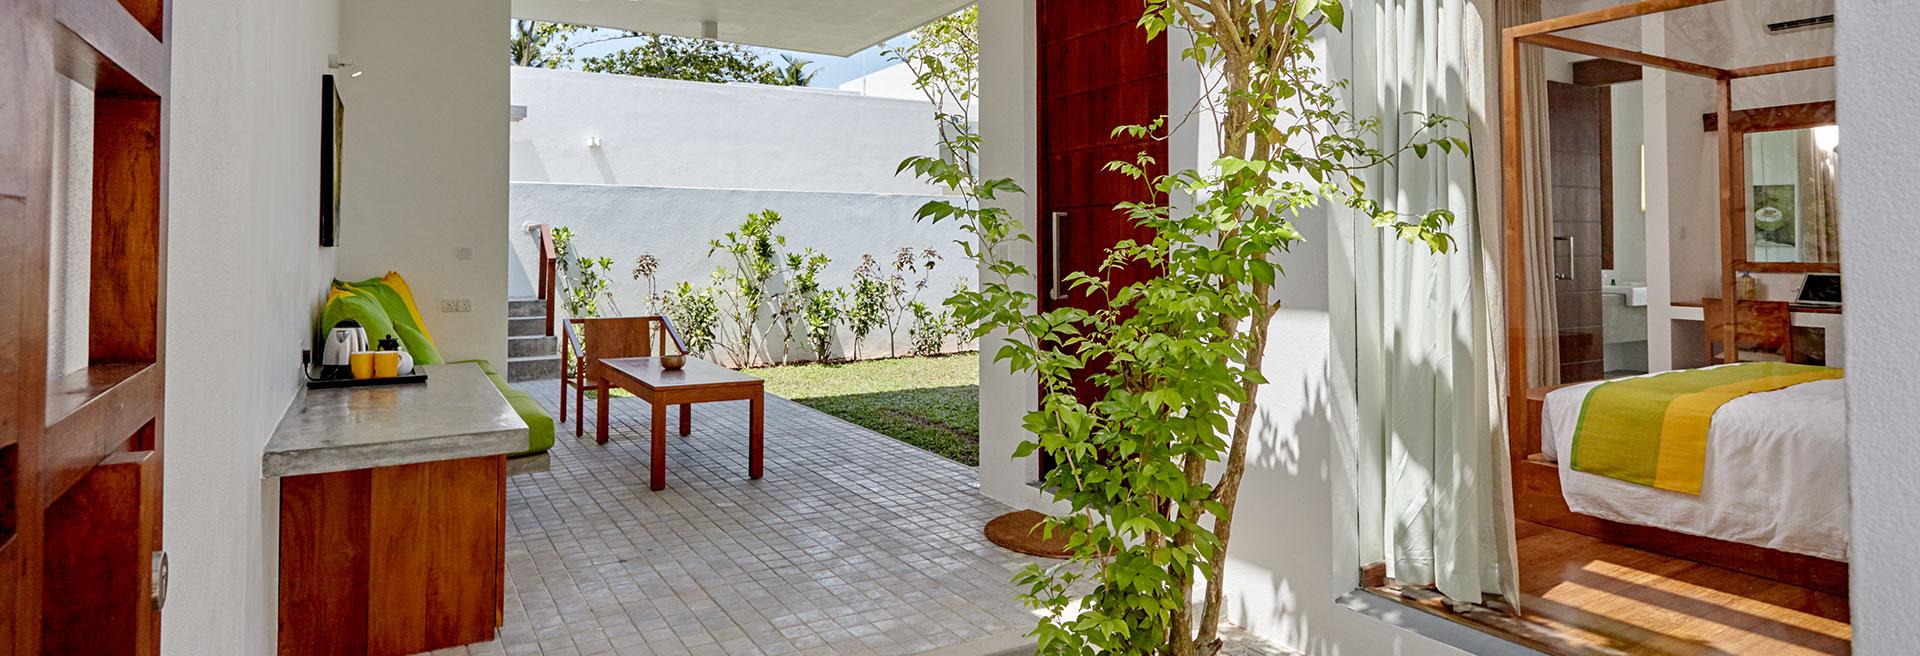 plant inside the villa